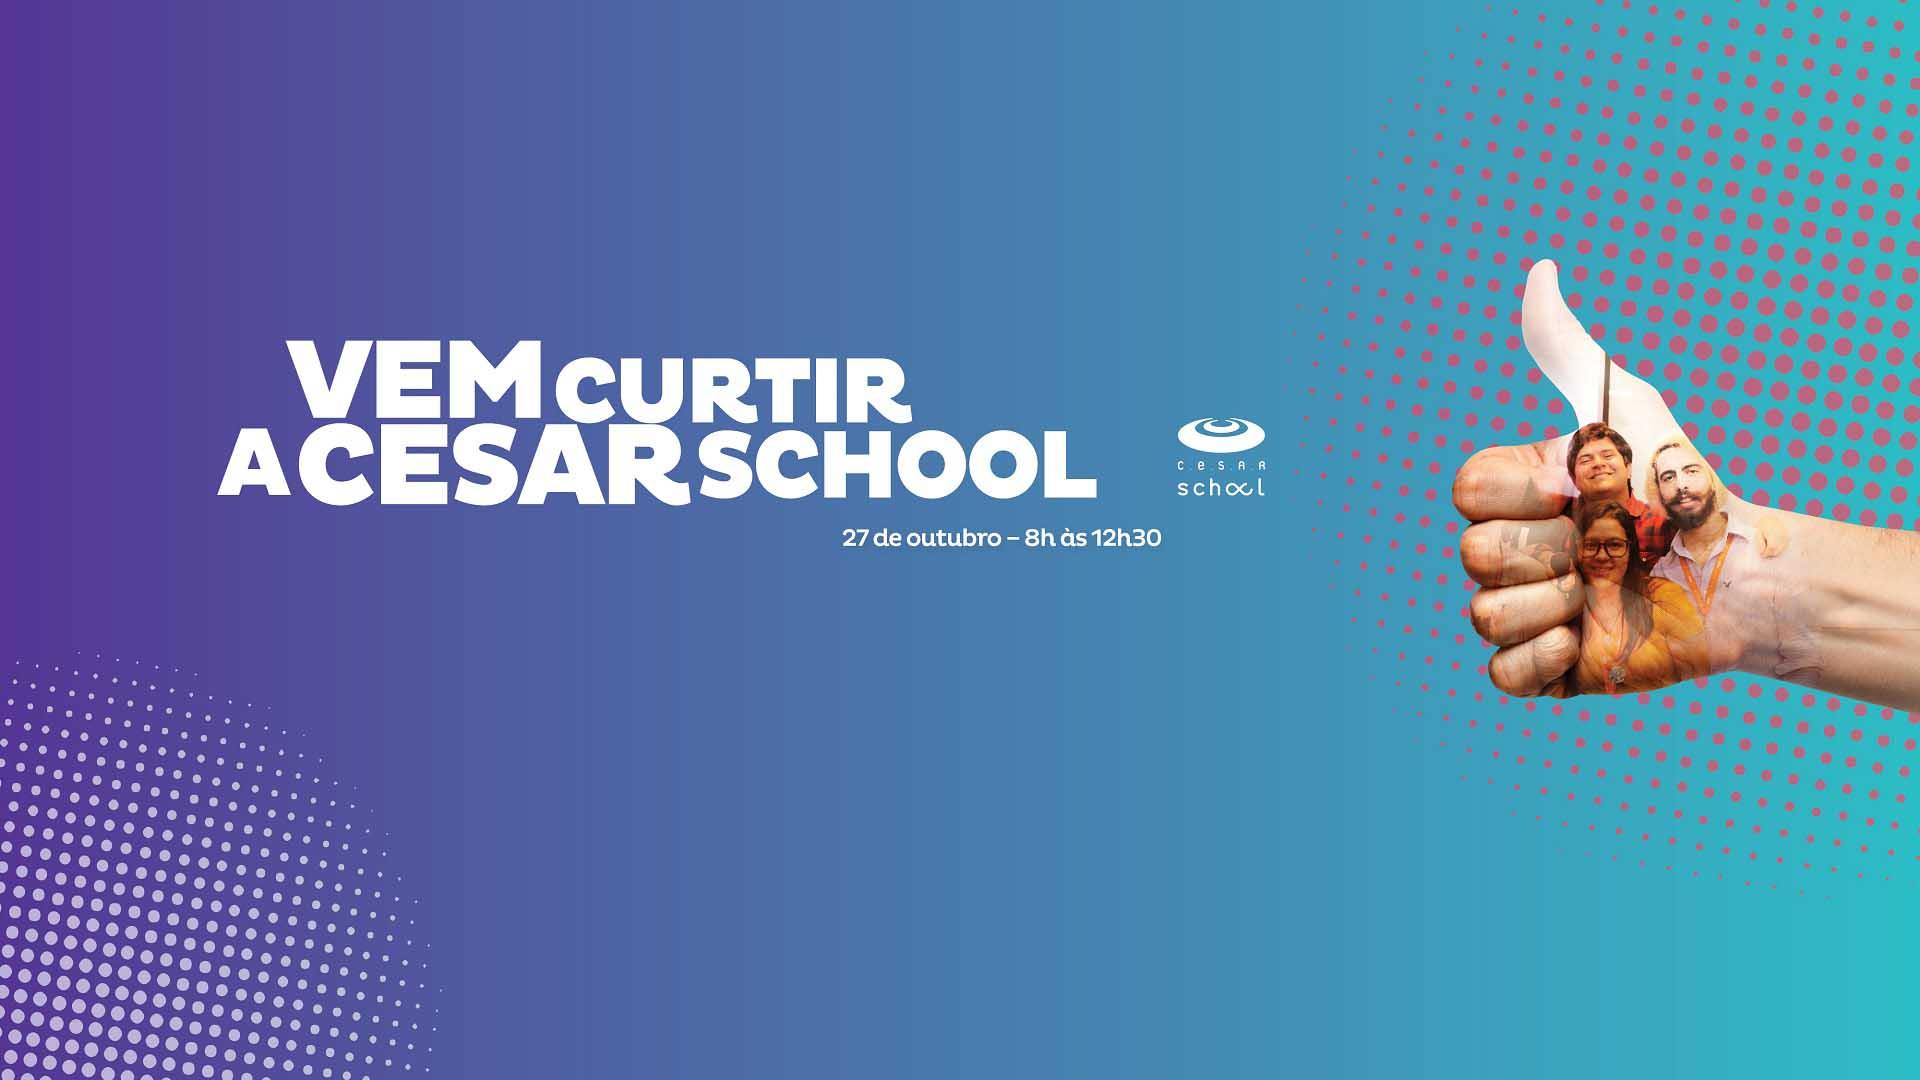 baixa_AF-CS-064-18-Banner Site Cesar School_Vem Curtir a Cesar School_1920x1080px